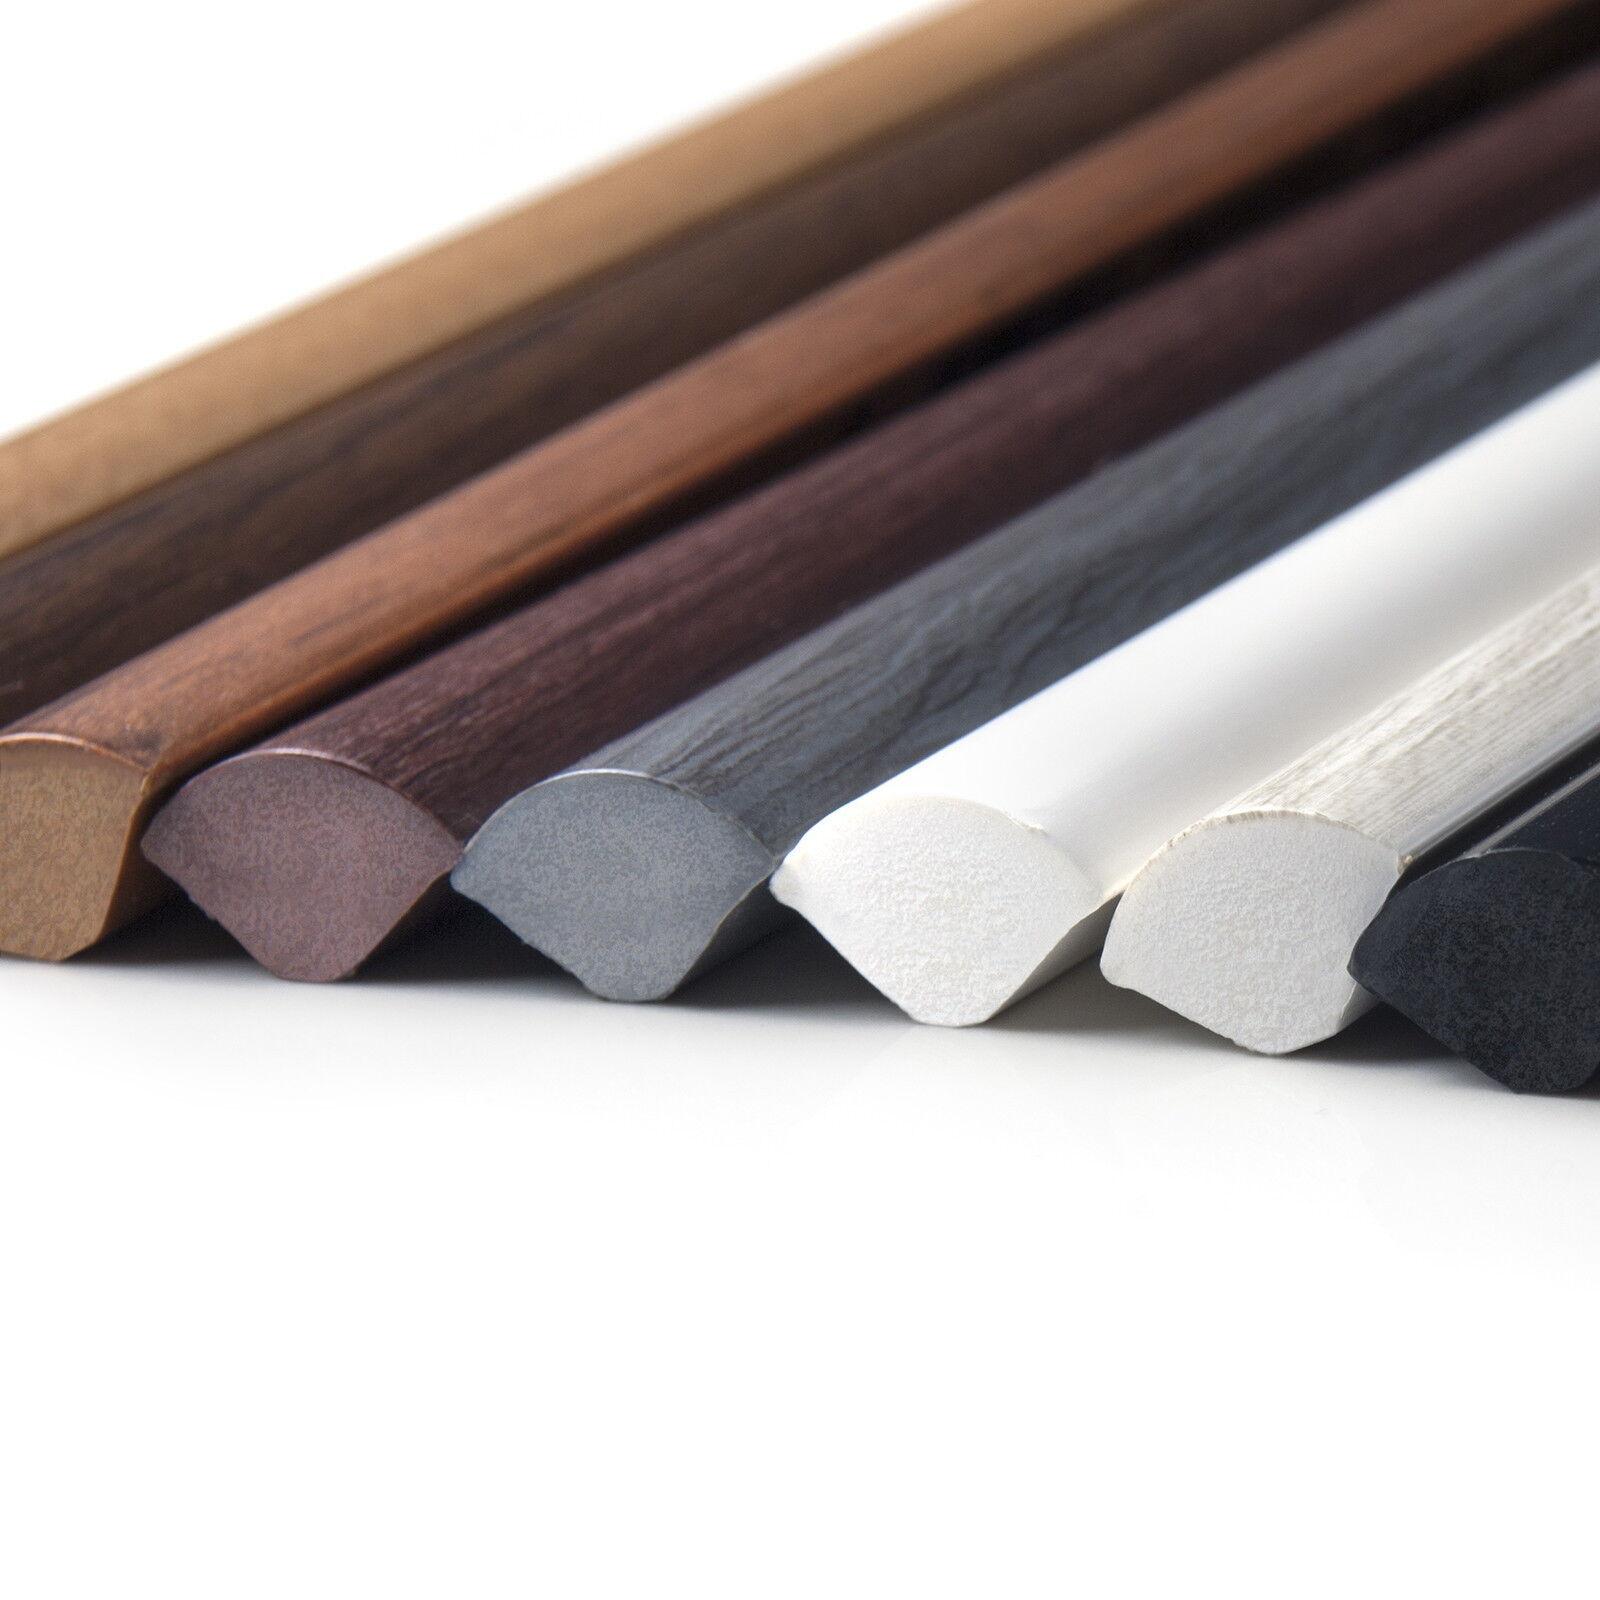 2.5m PVC QUARTER ROUND 13mm corner profile rod bar